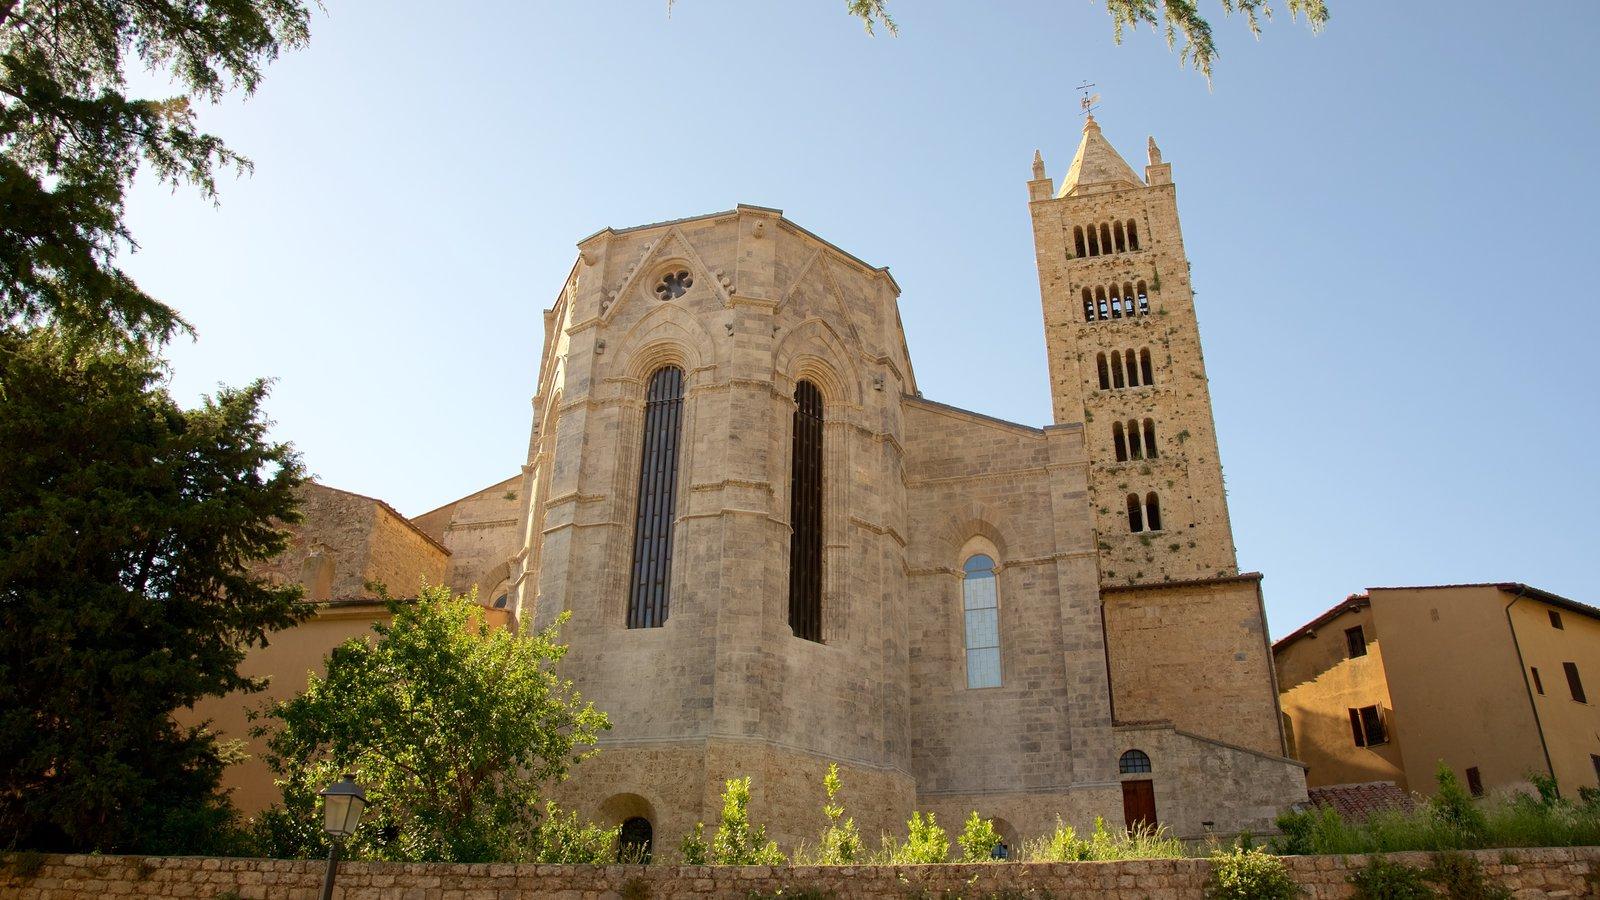 Massa Marittima featuring heritage architecture